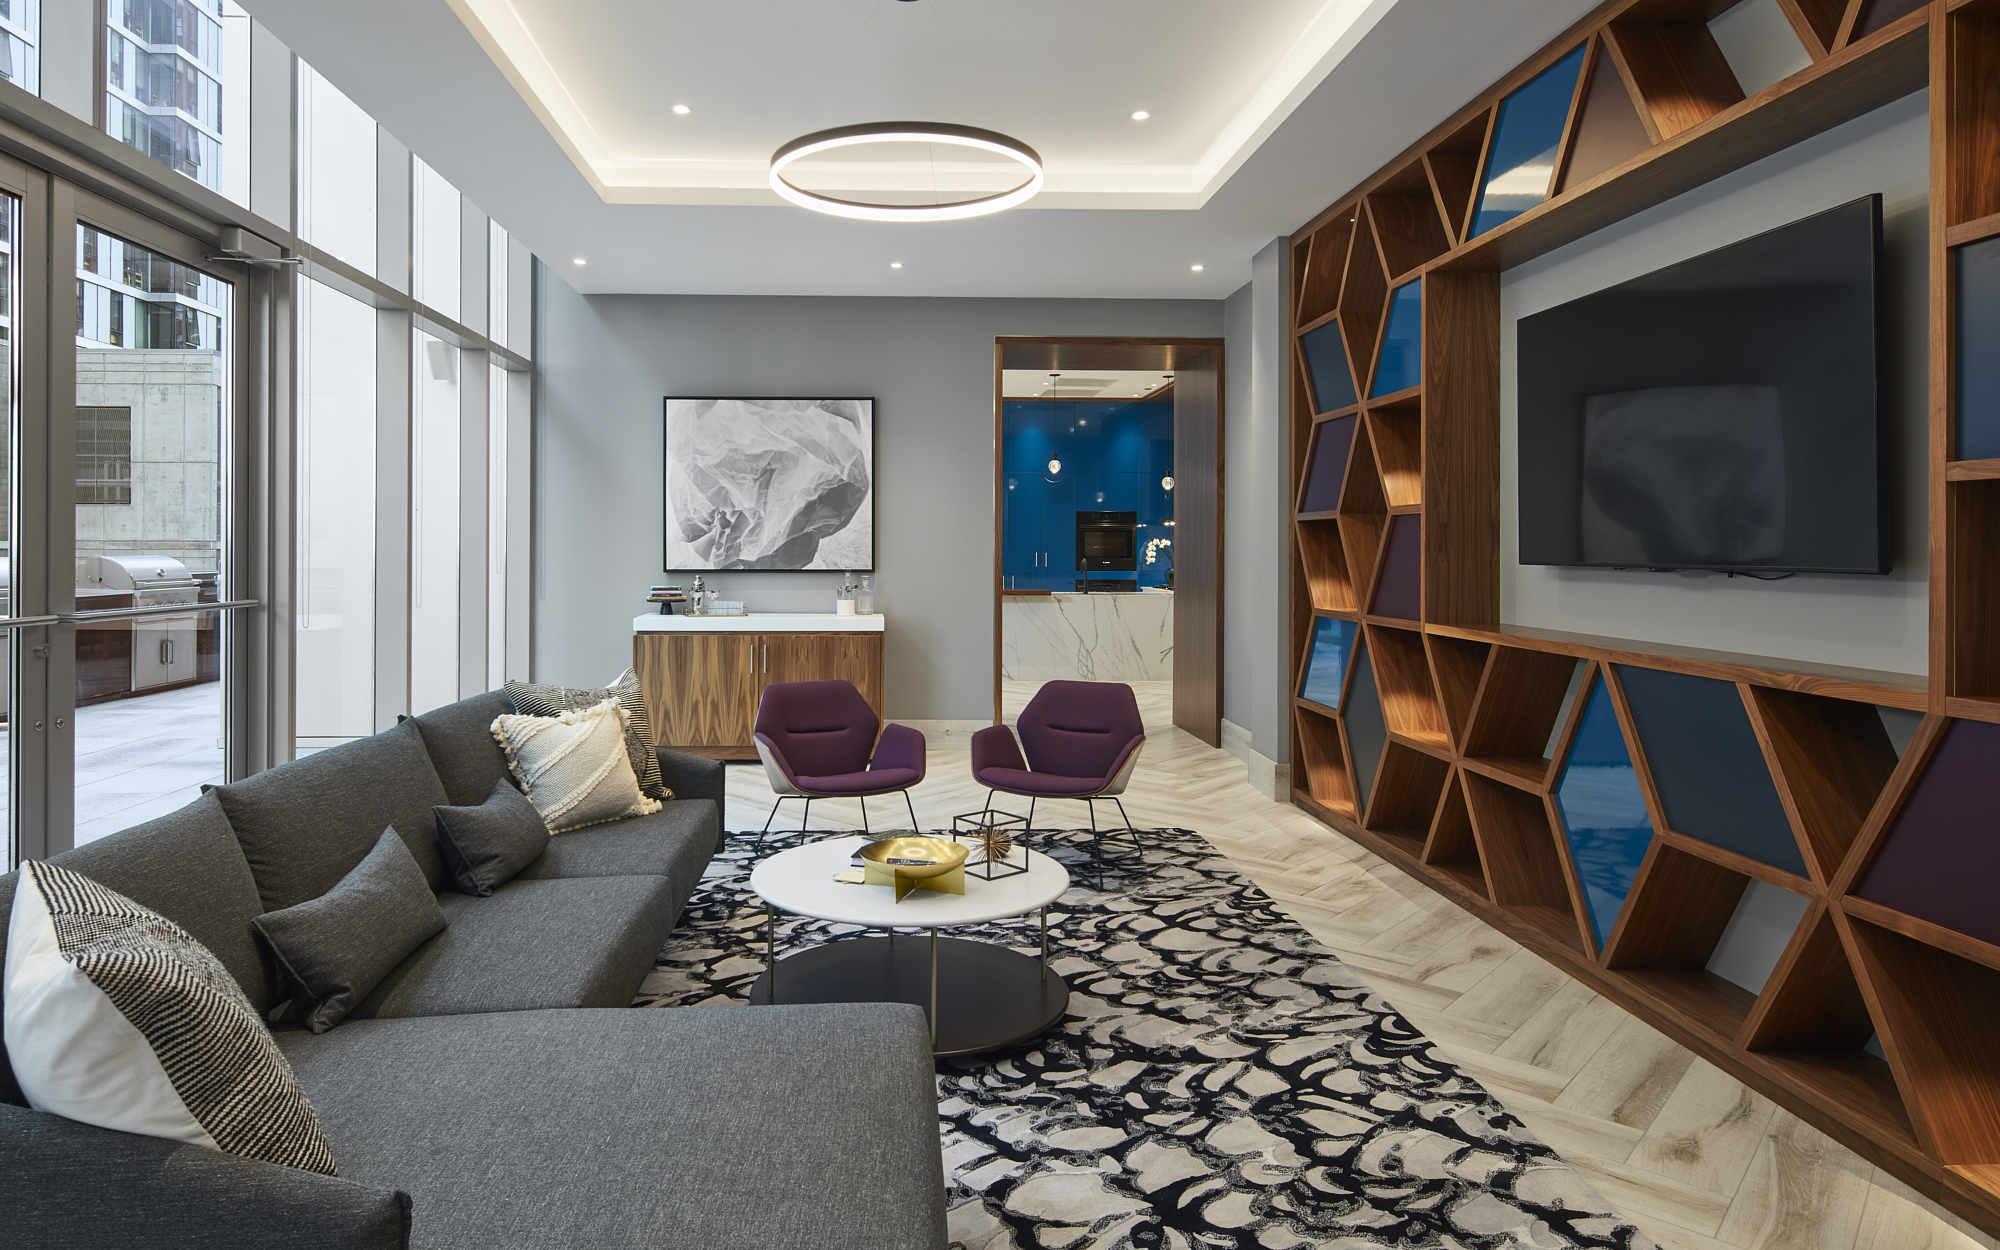 Essex apartments community lounge space